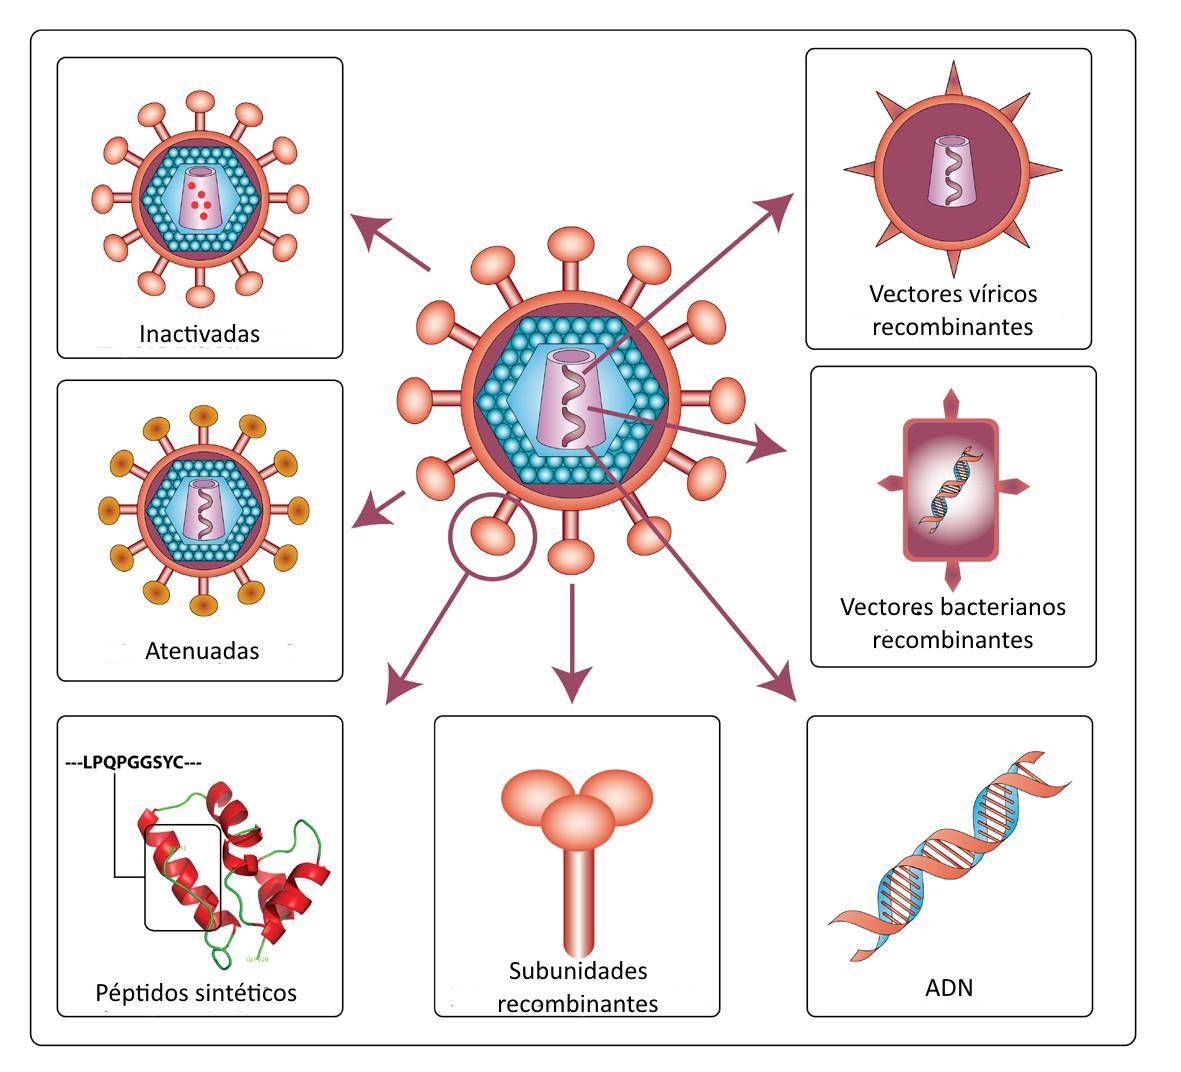 B.log.ia 2.0: Sistema Inmunitario III: aspectos médicos